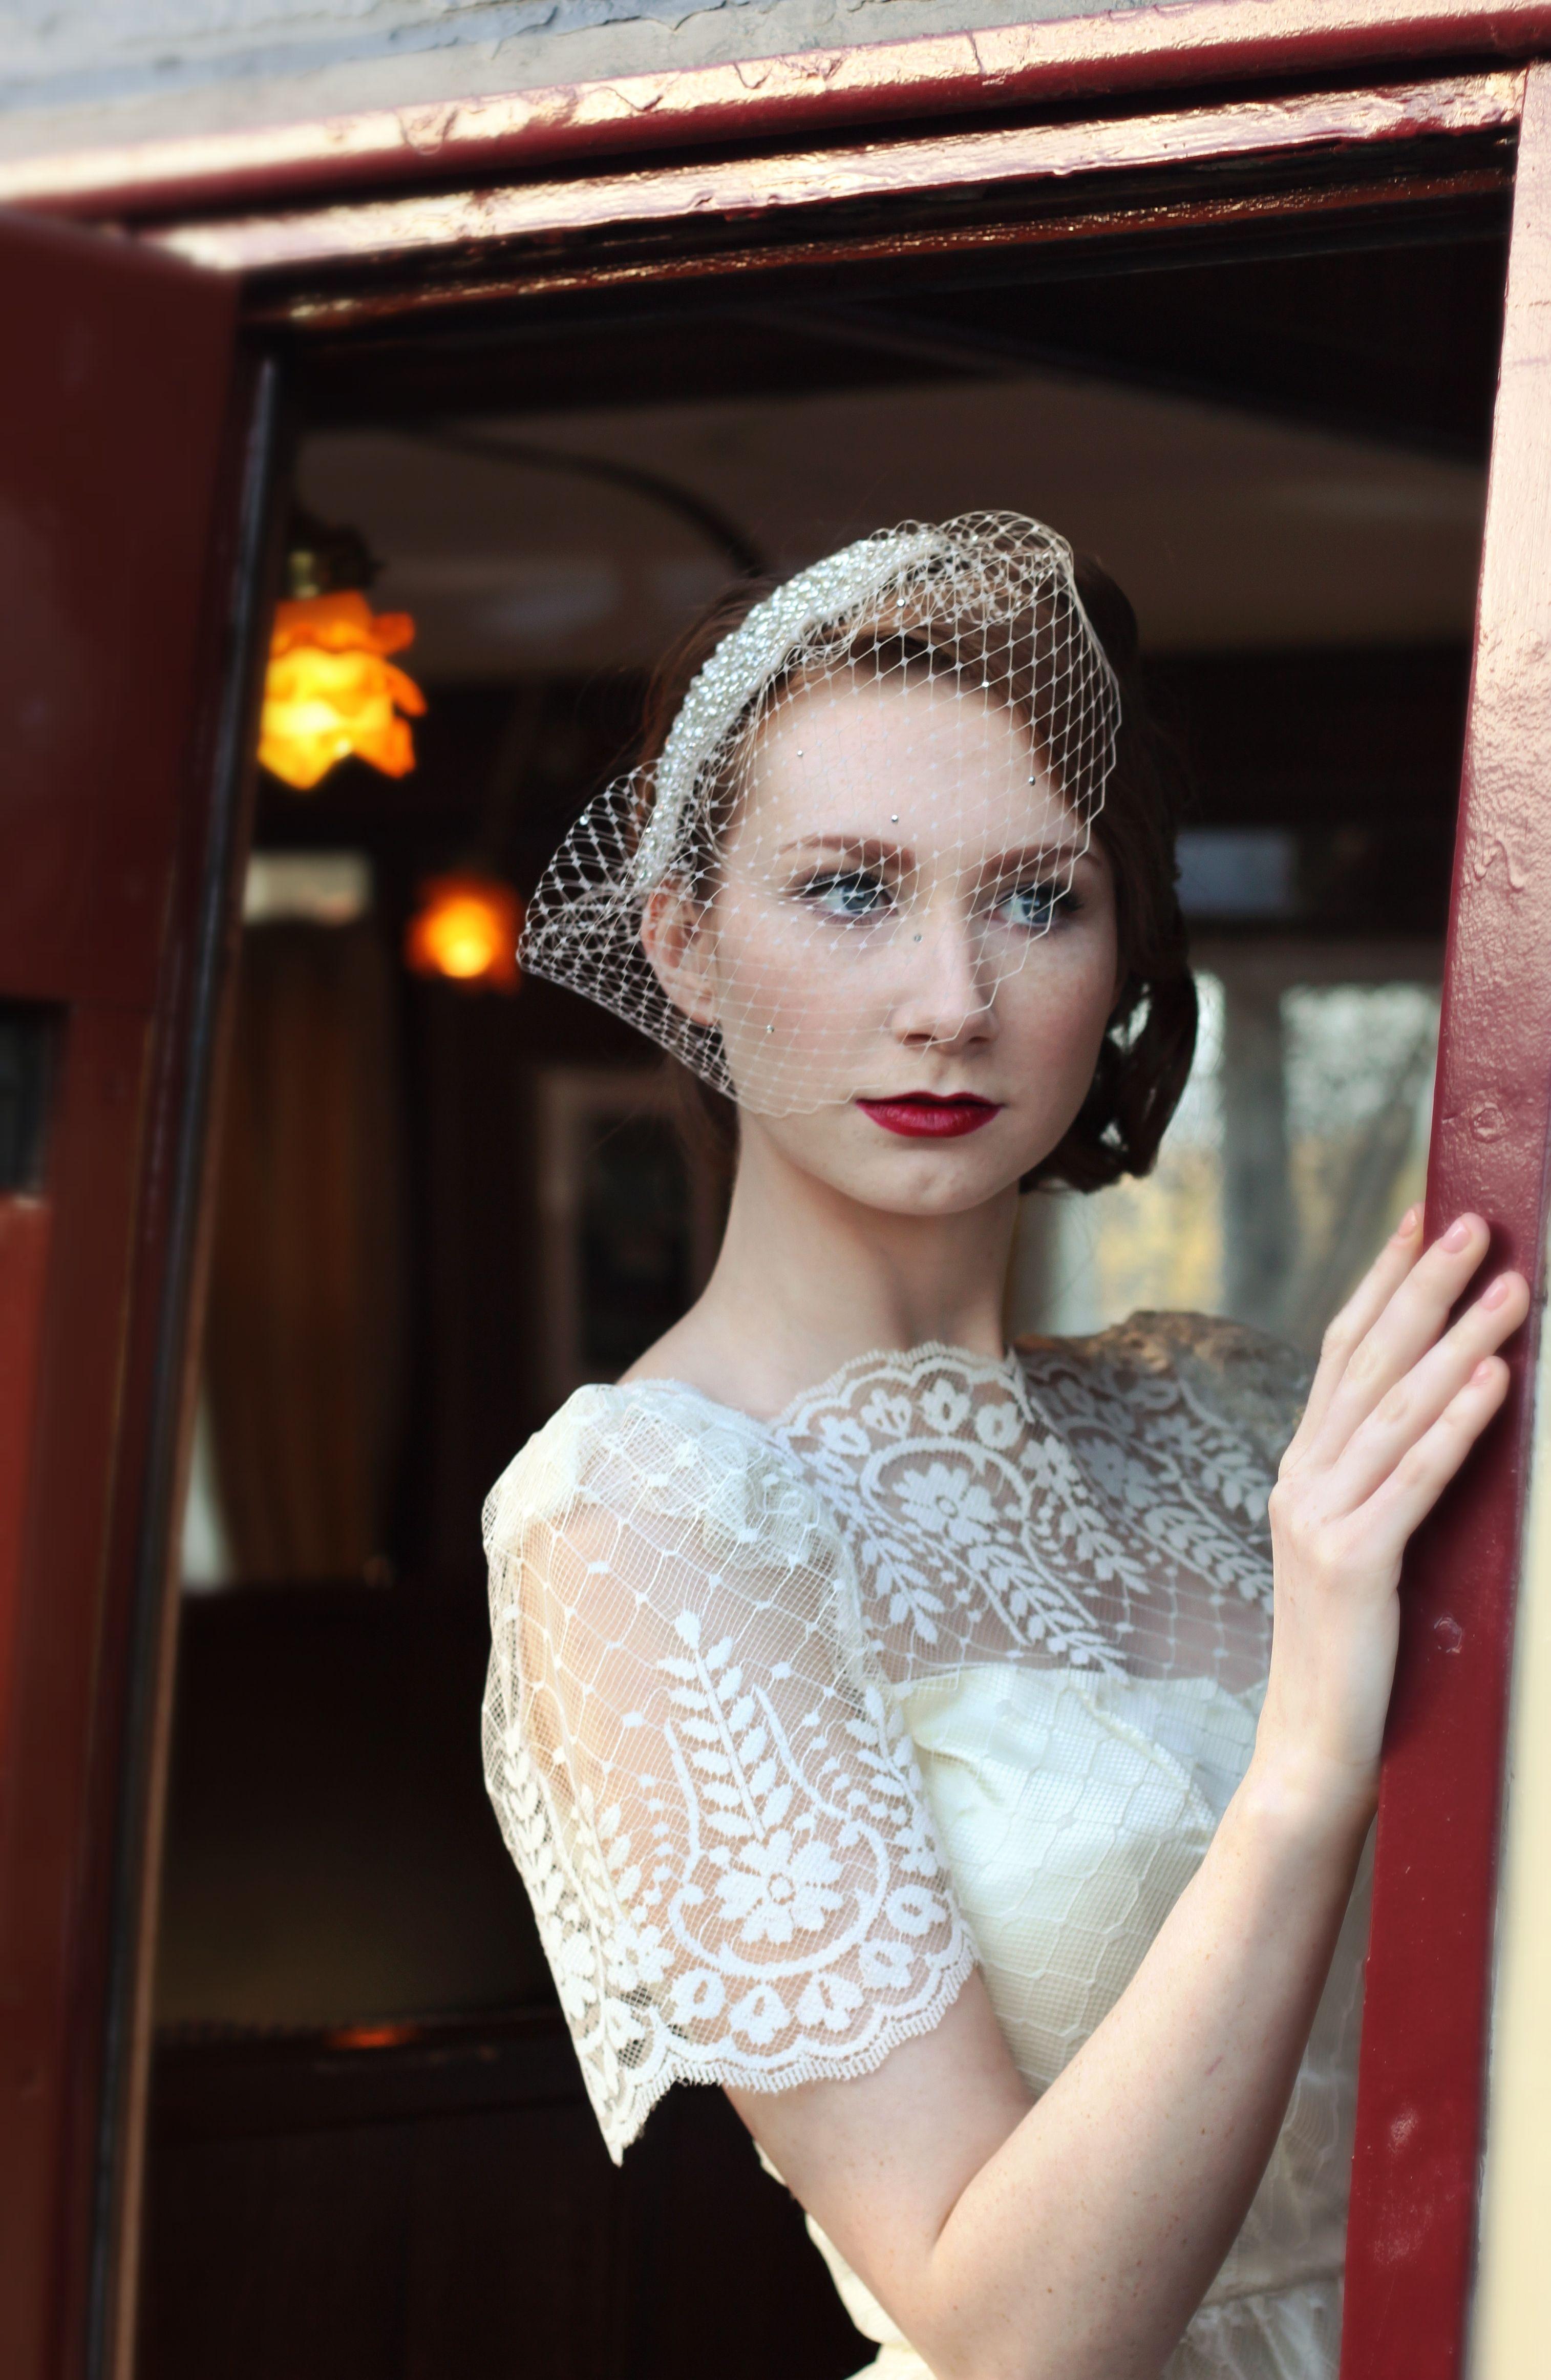 1950s Lace Wedding Dress Lace Tea Length Vintage Bridal Makeup Birdcage Veil Www Vintagepearl Bridal Shoes Vintage Vintage Bridal Makeup Belle Bridal